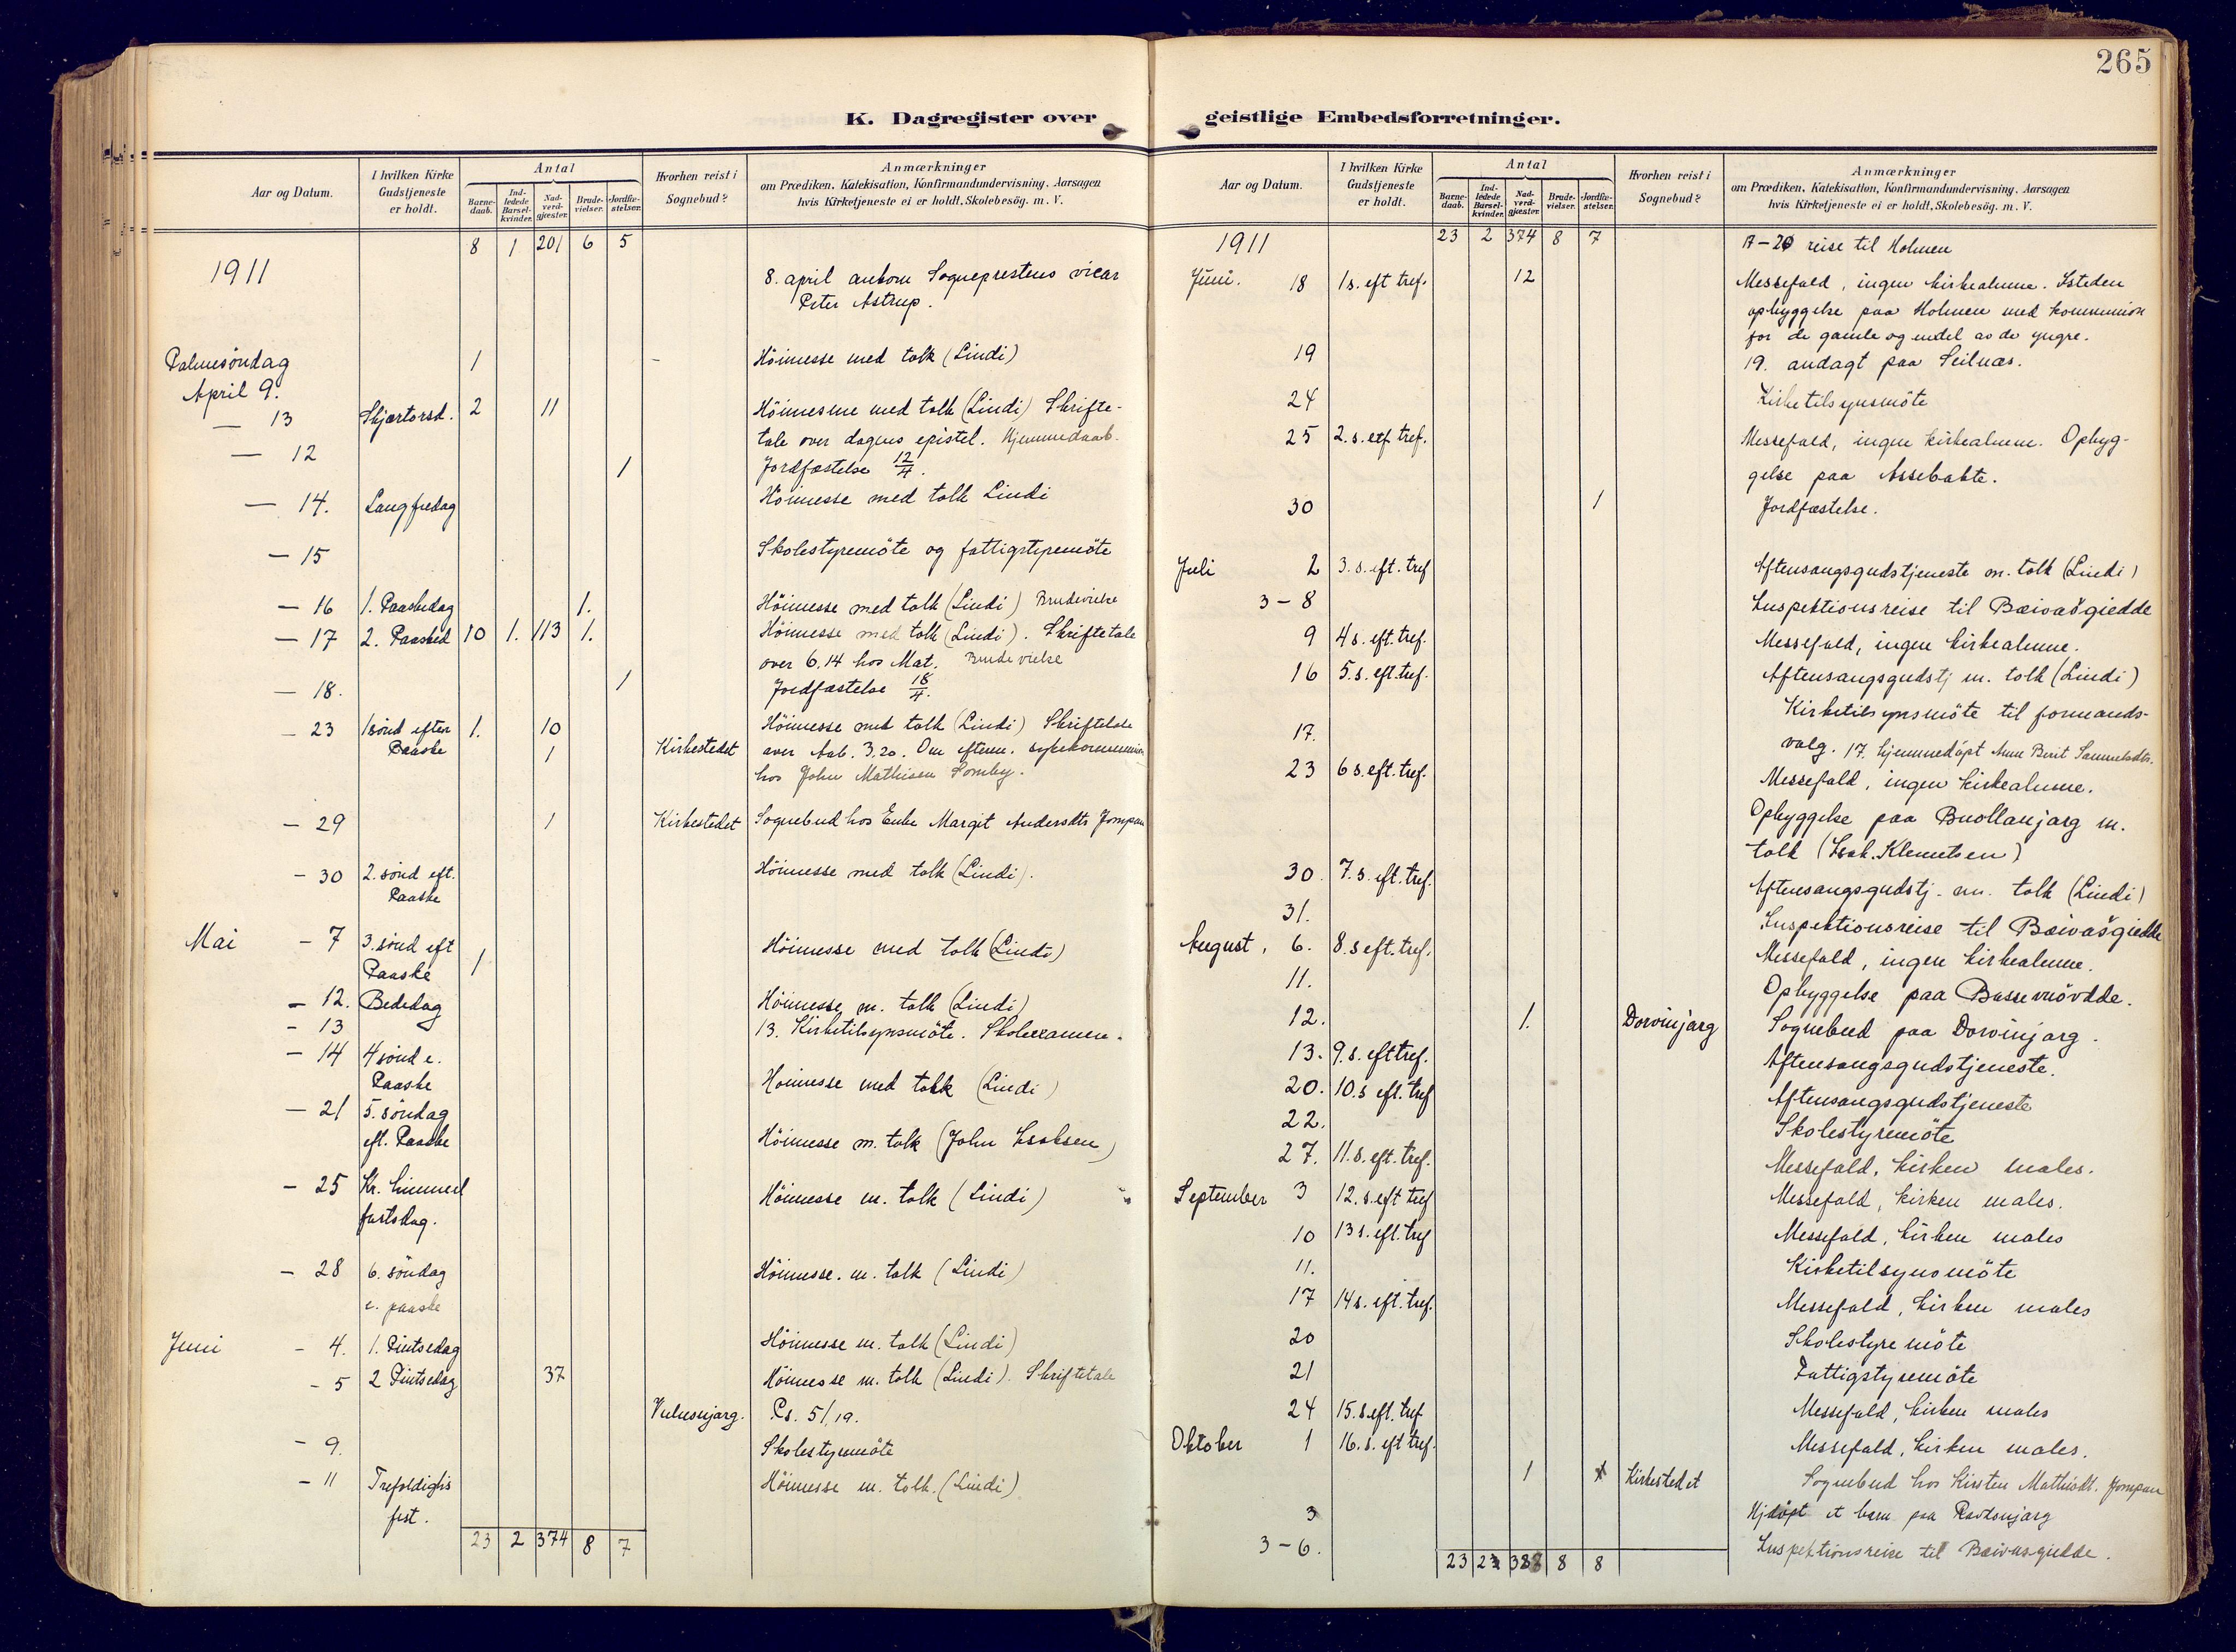 SATØ, Karasjok sokneprestkontor, H/Ha: Ministerialbok nr. 3, 1907-1926, s. 265